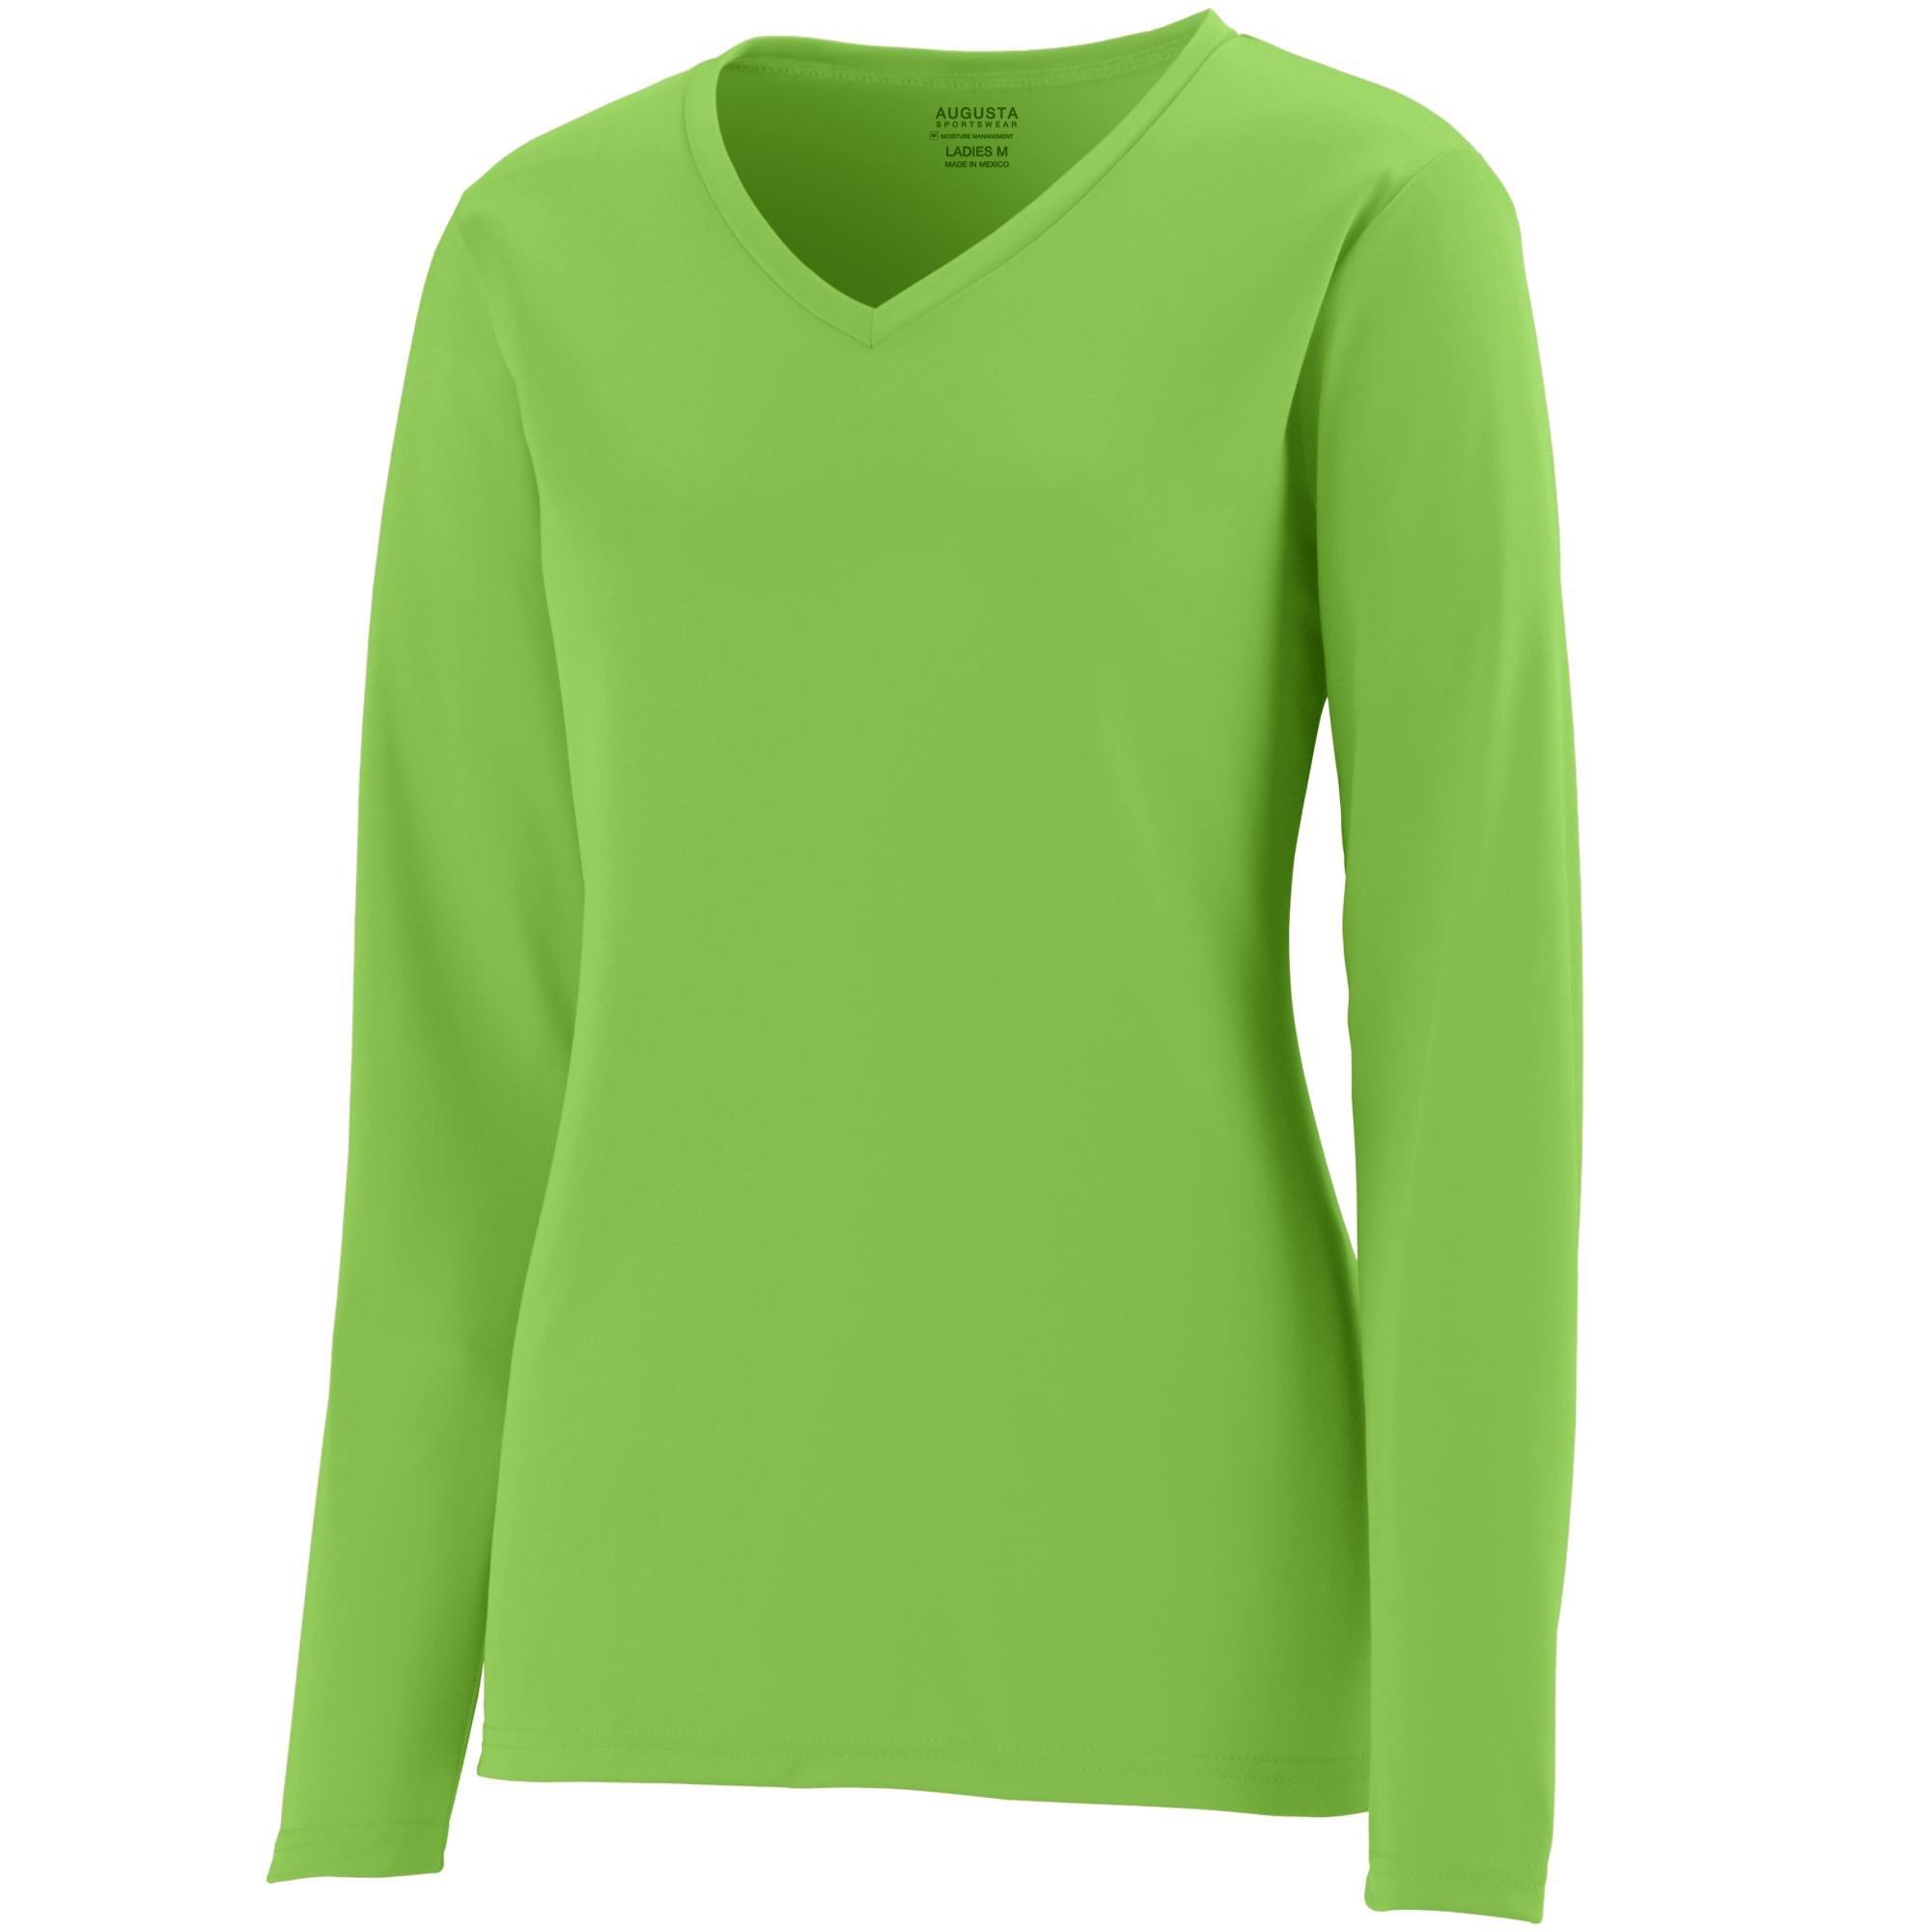 Augusta Sportswear Womens Long Sleeve Wicking T-Shirt, Lime, 3X-Large